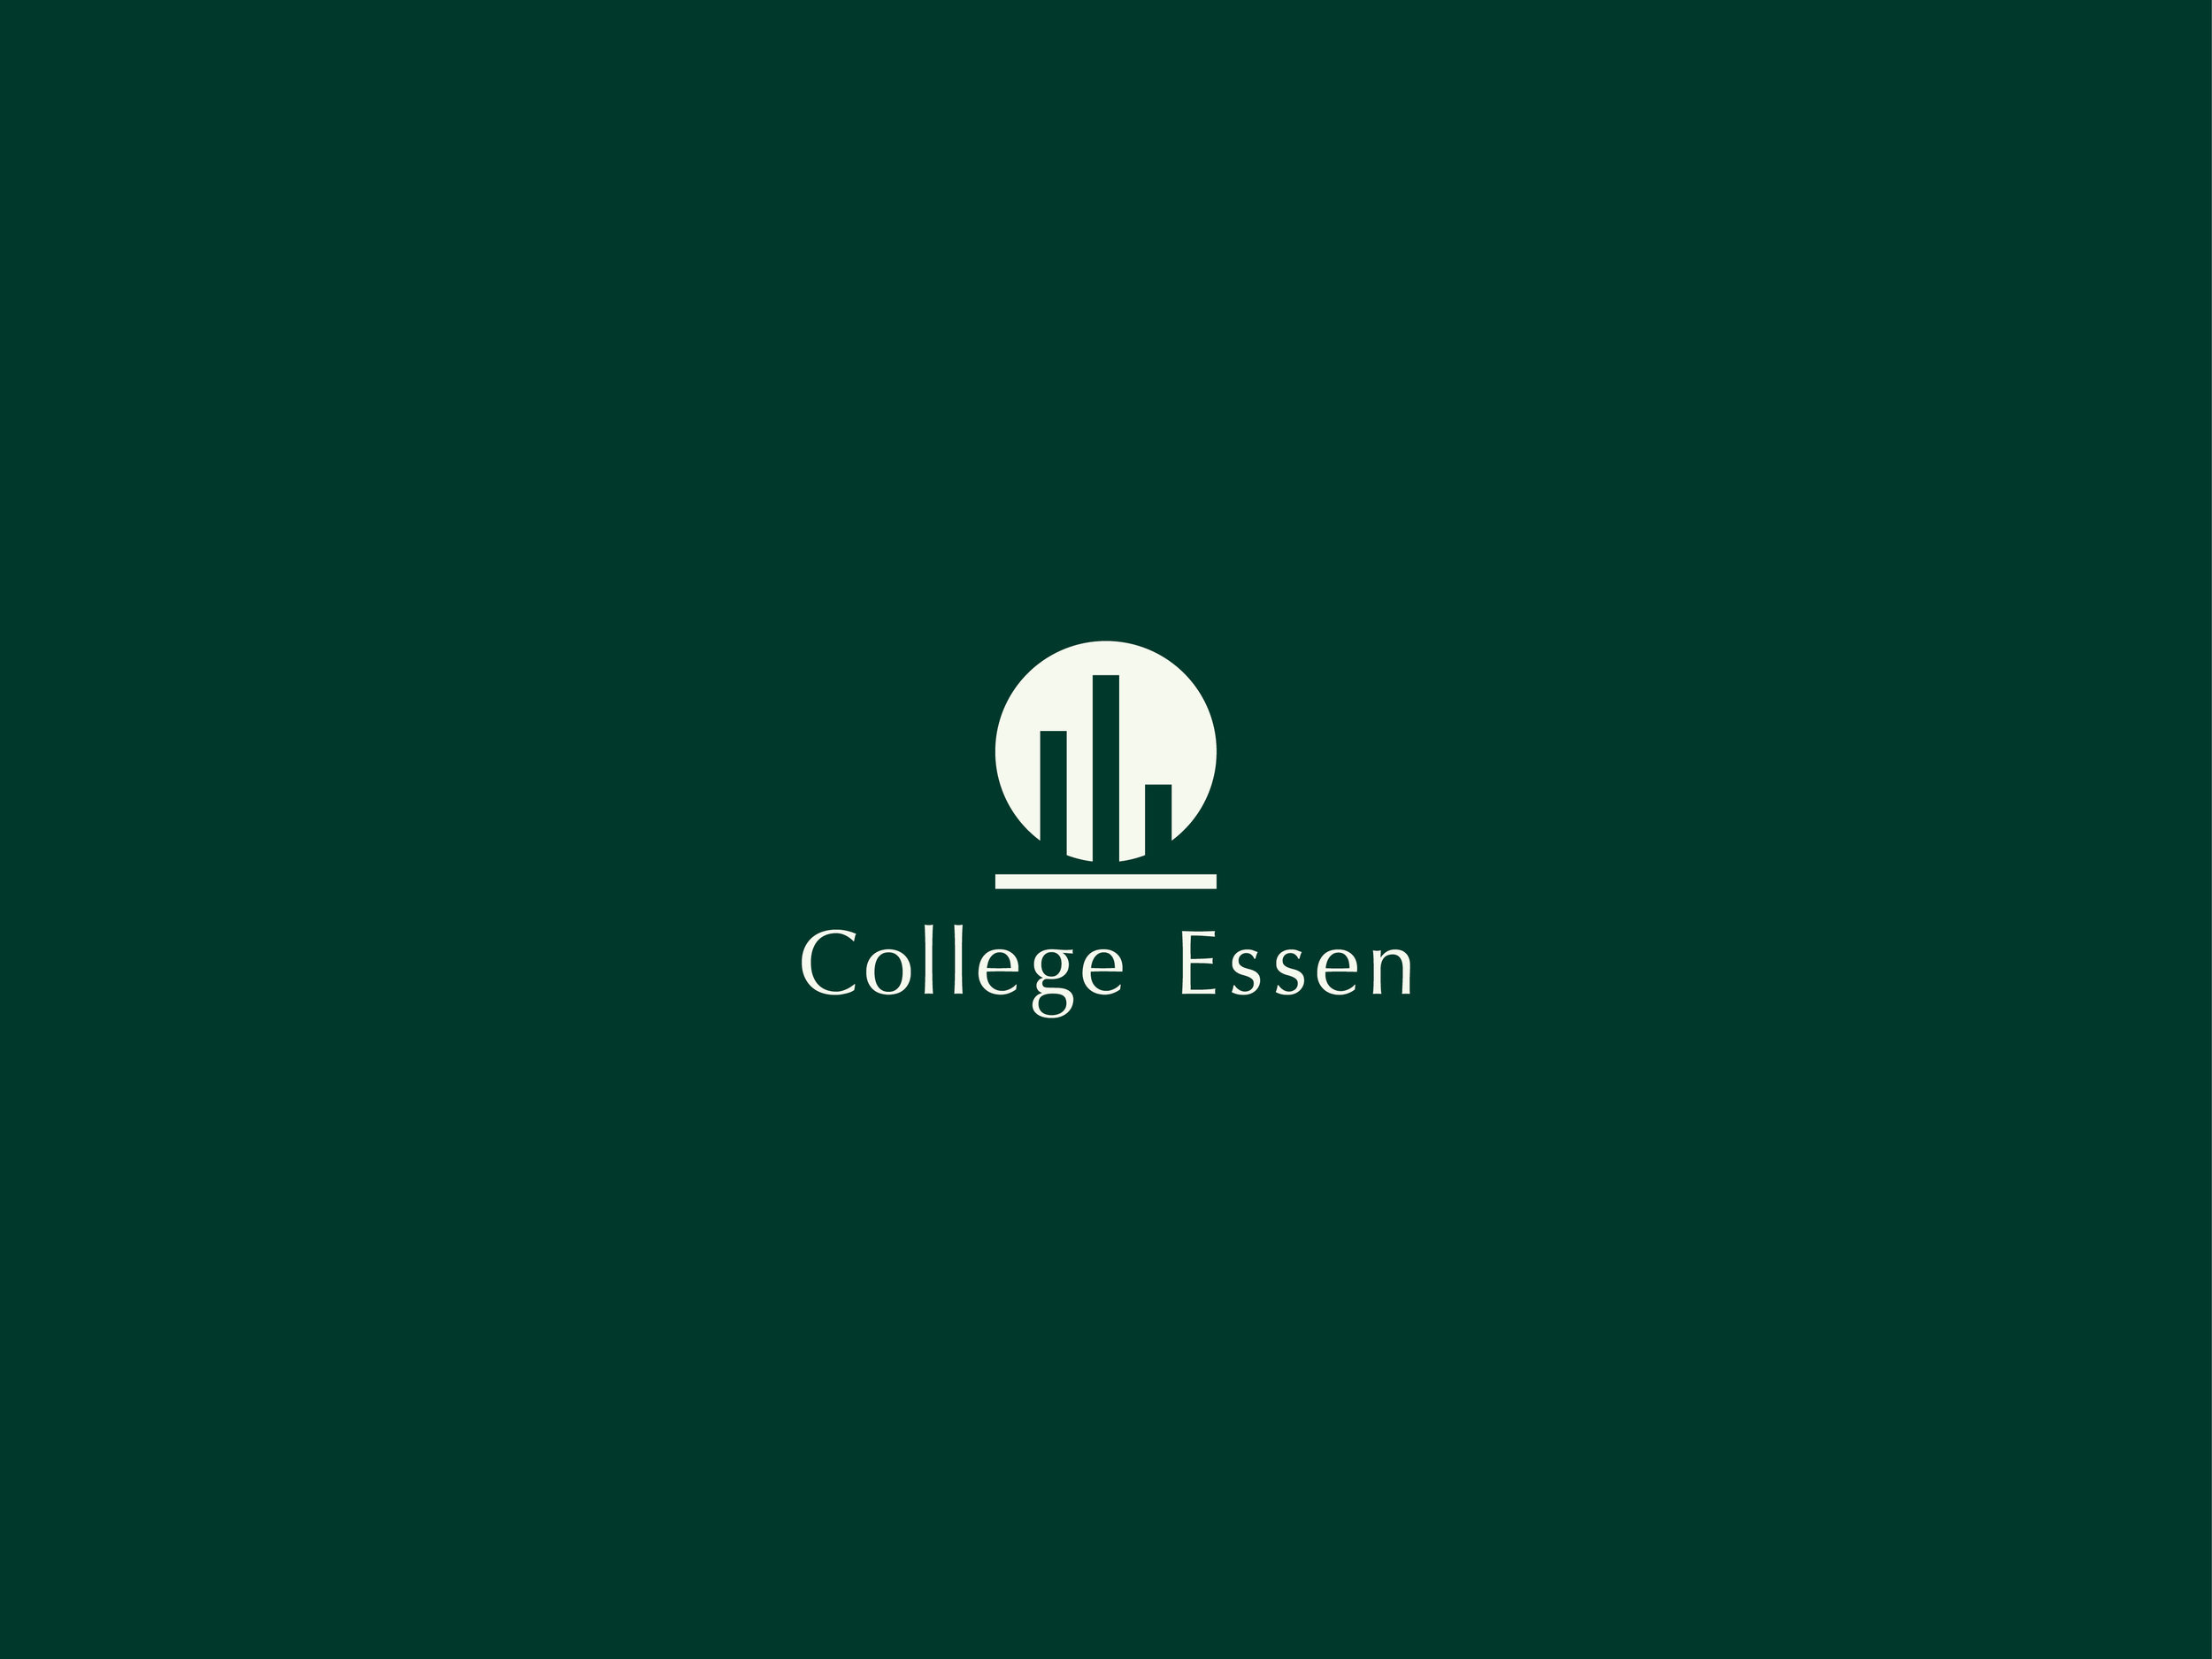 College Essen Branding Chloe